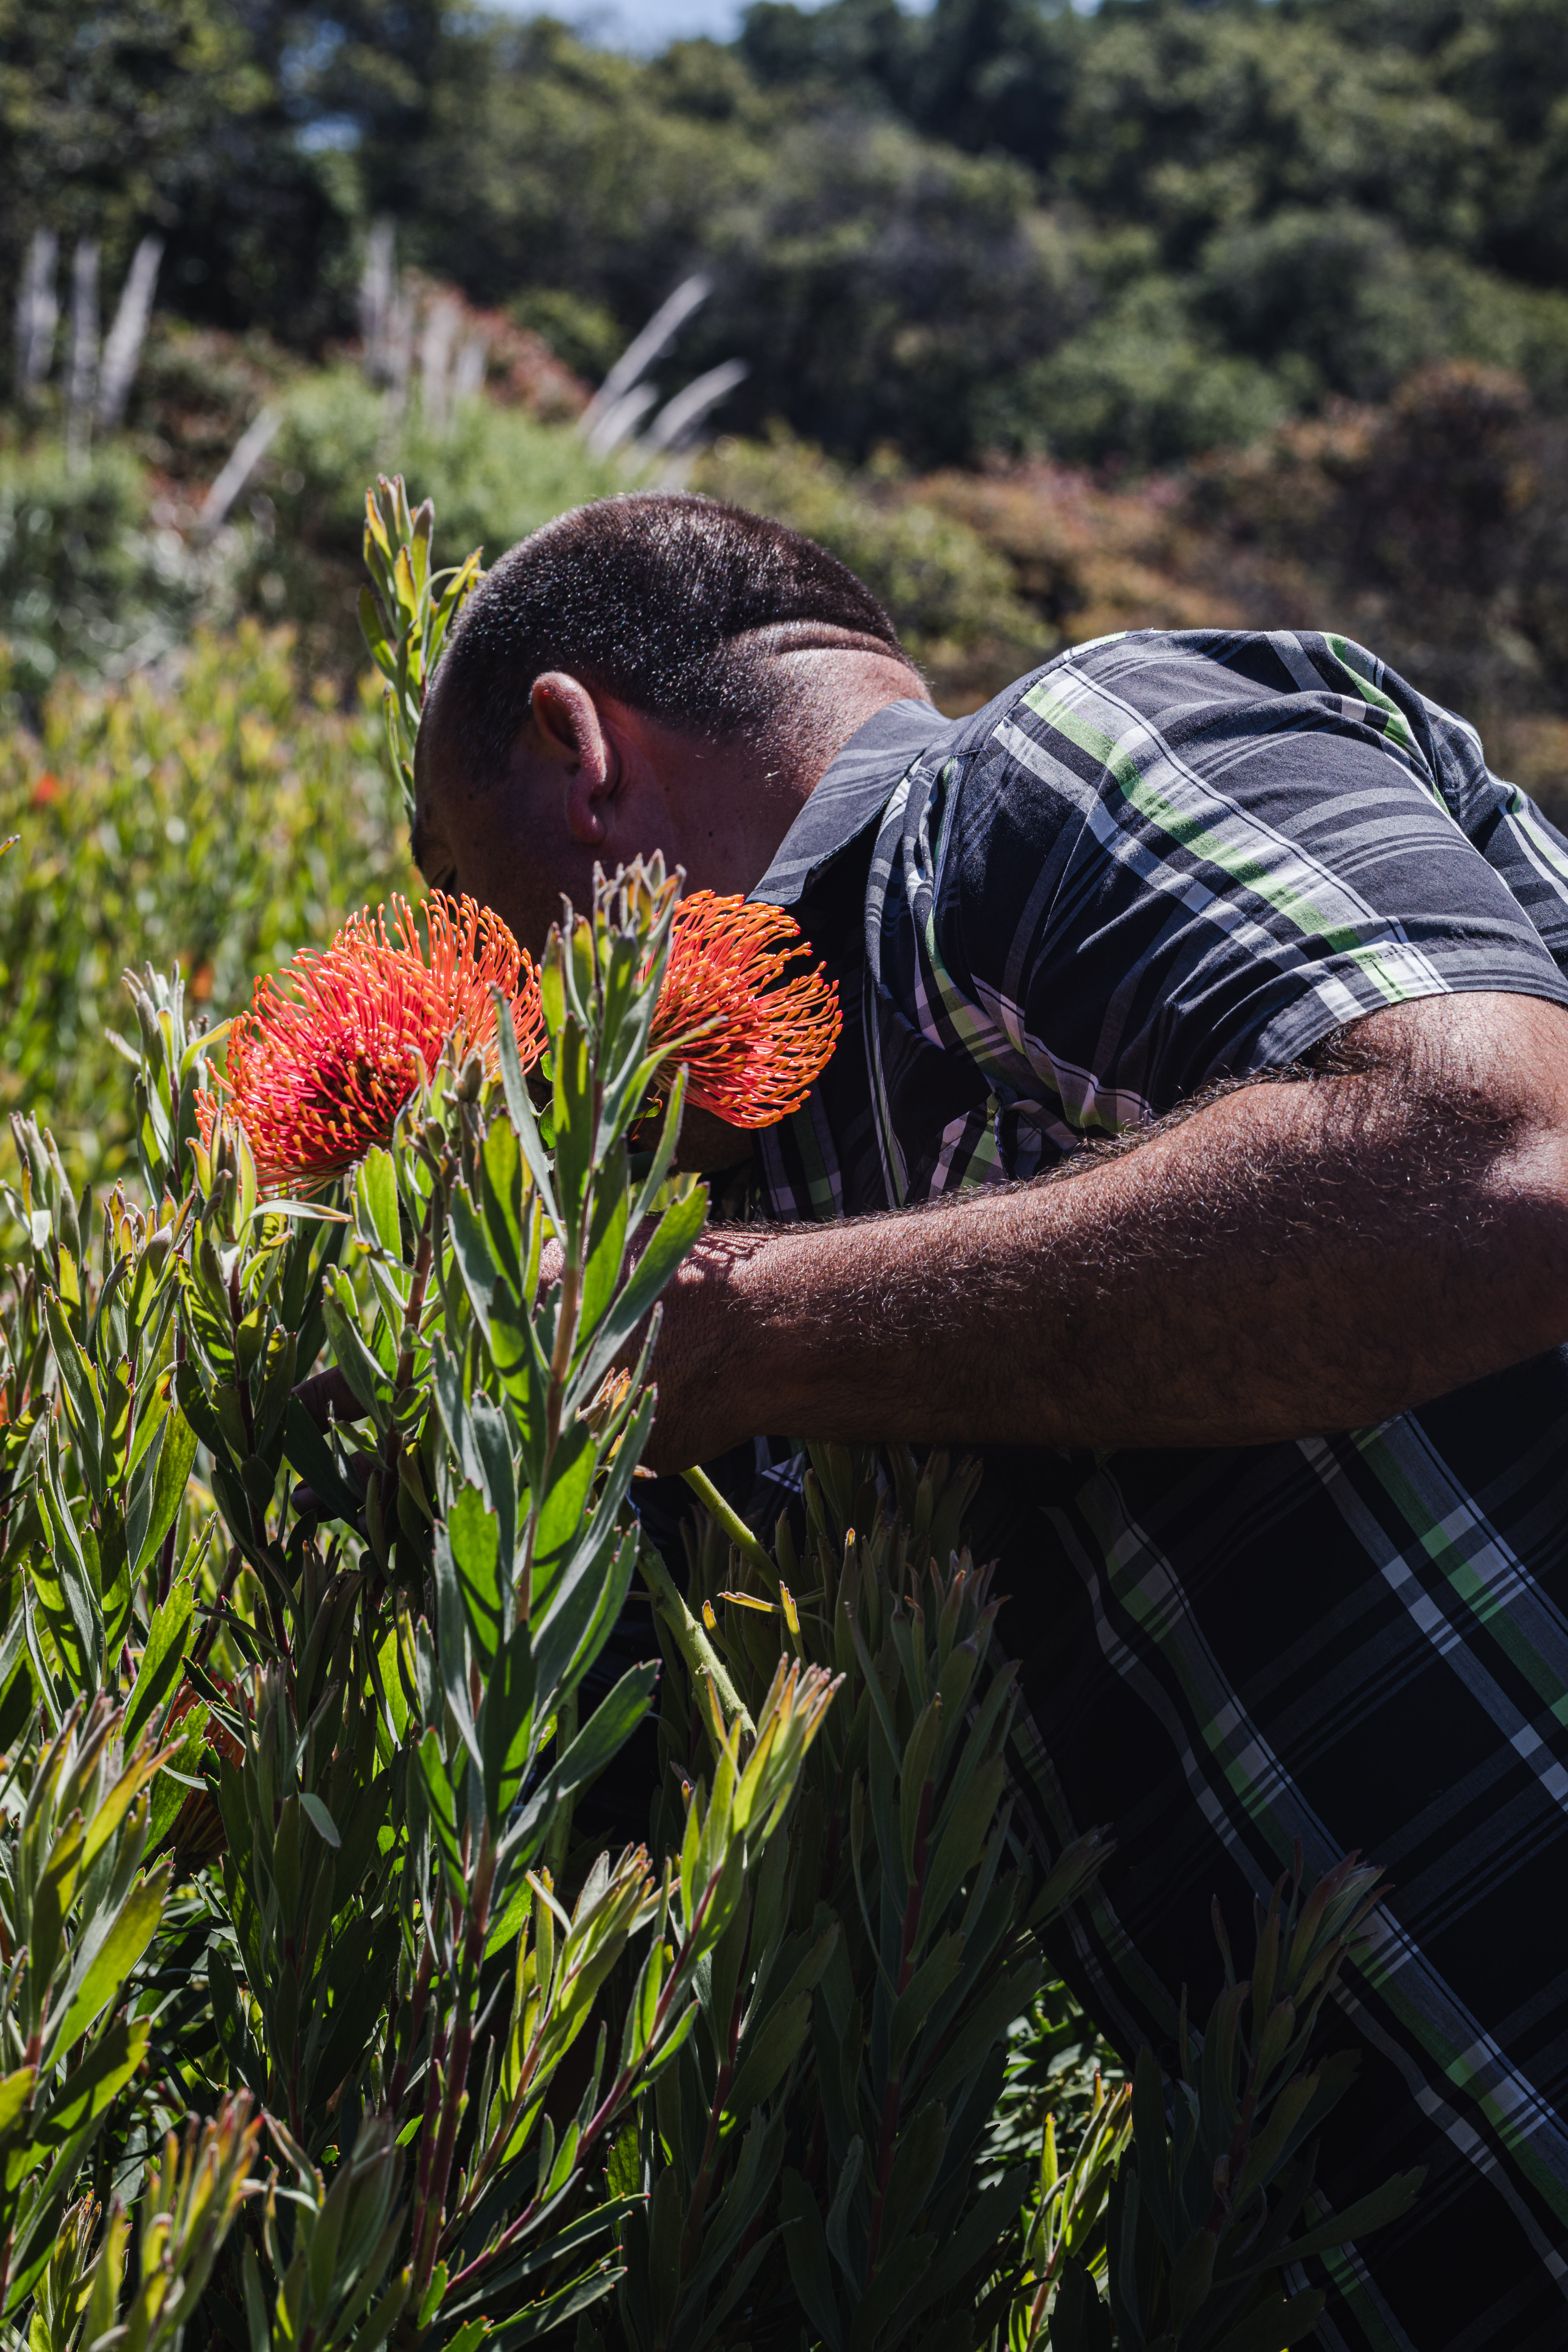 JSM Organics founder Javier Zamora picking fresh flowers.